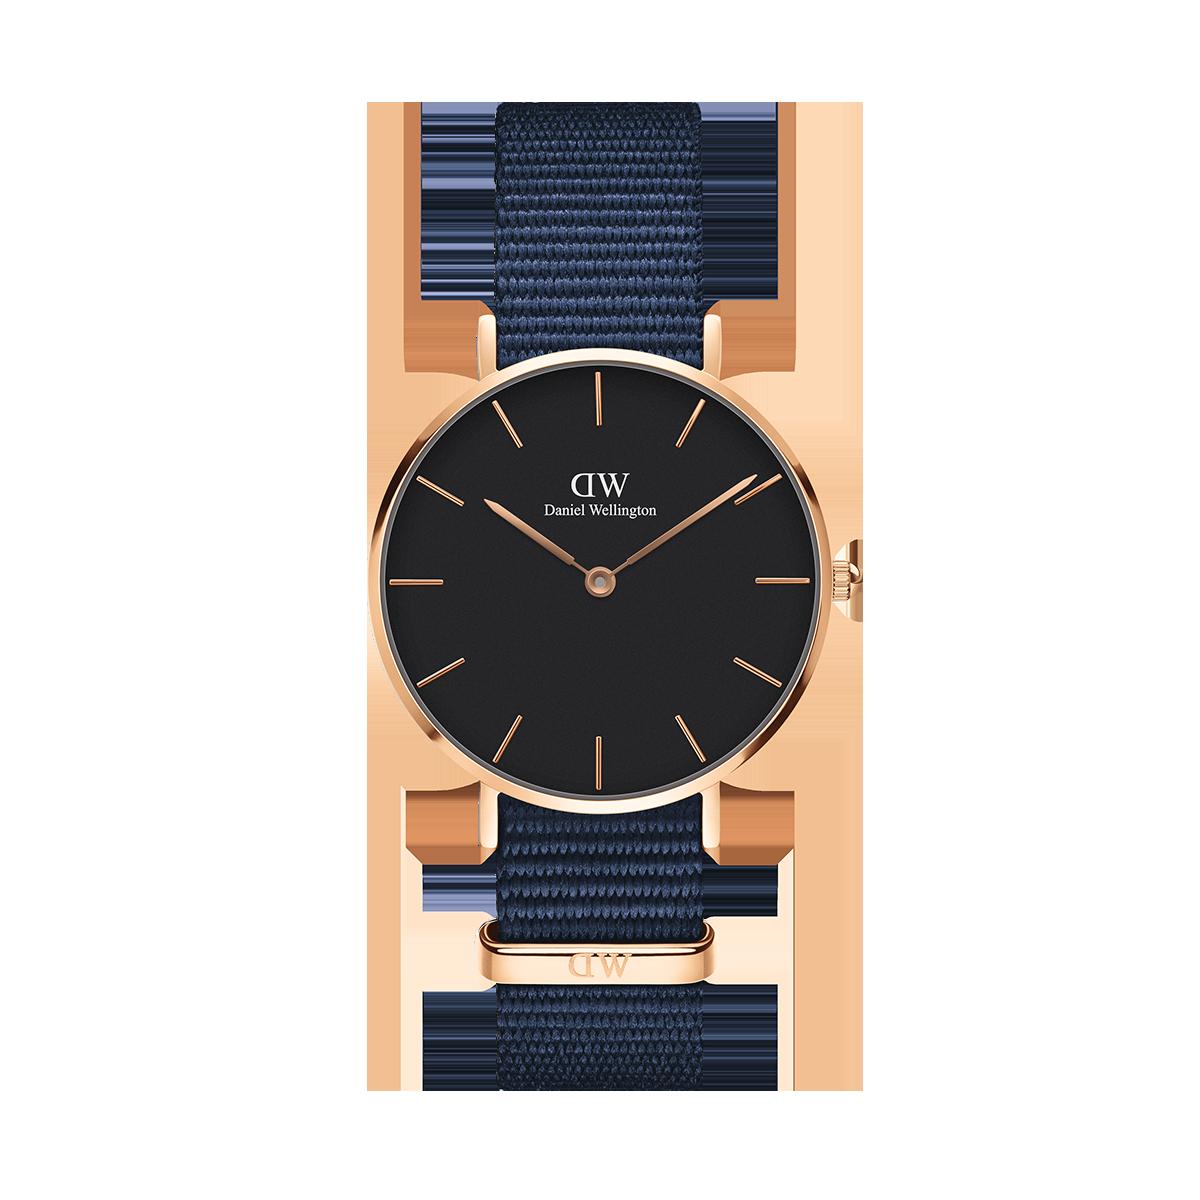 d0c2ae8dd3 Daniel Wellington   Timeless and elegant watches online